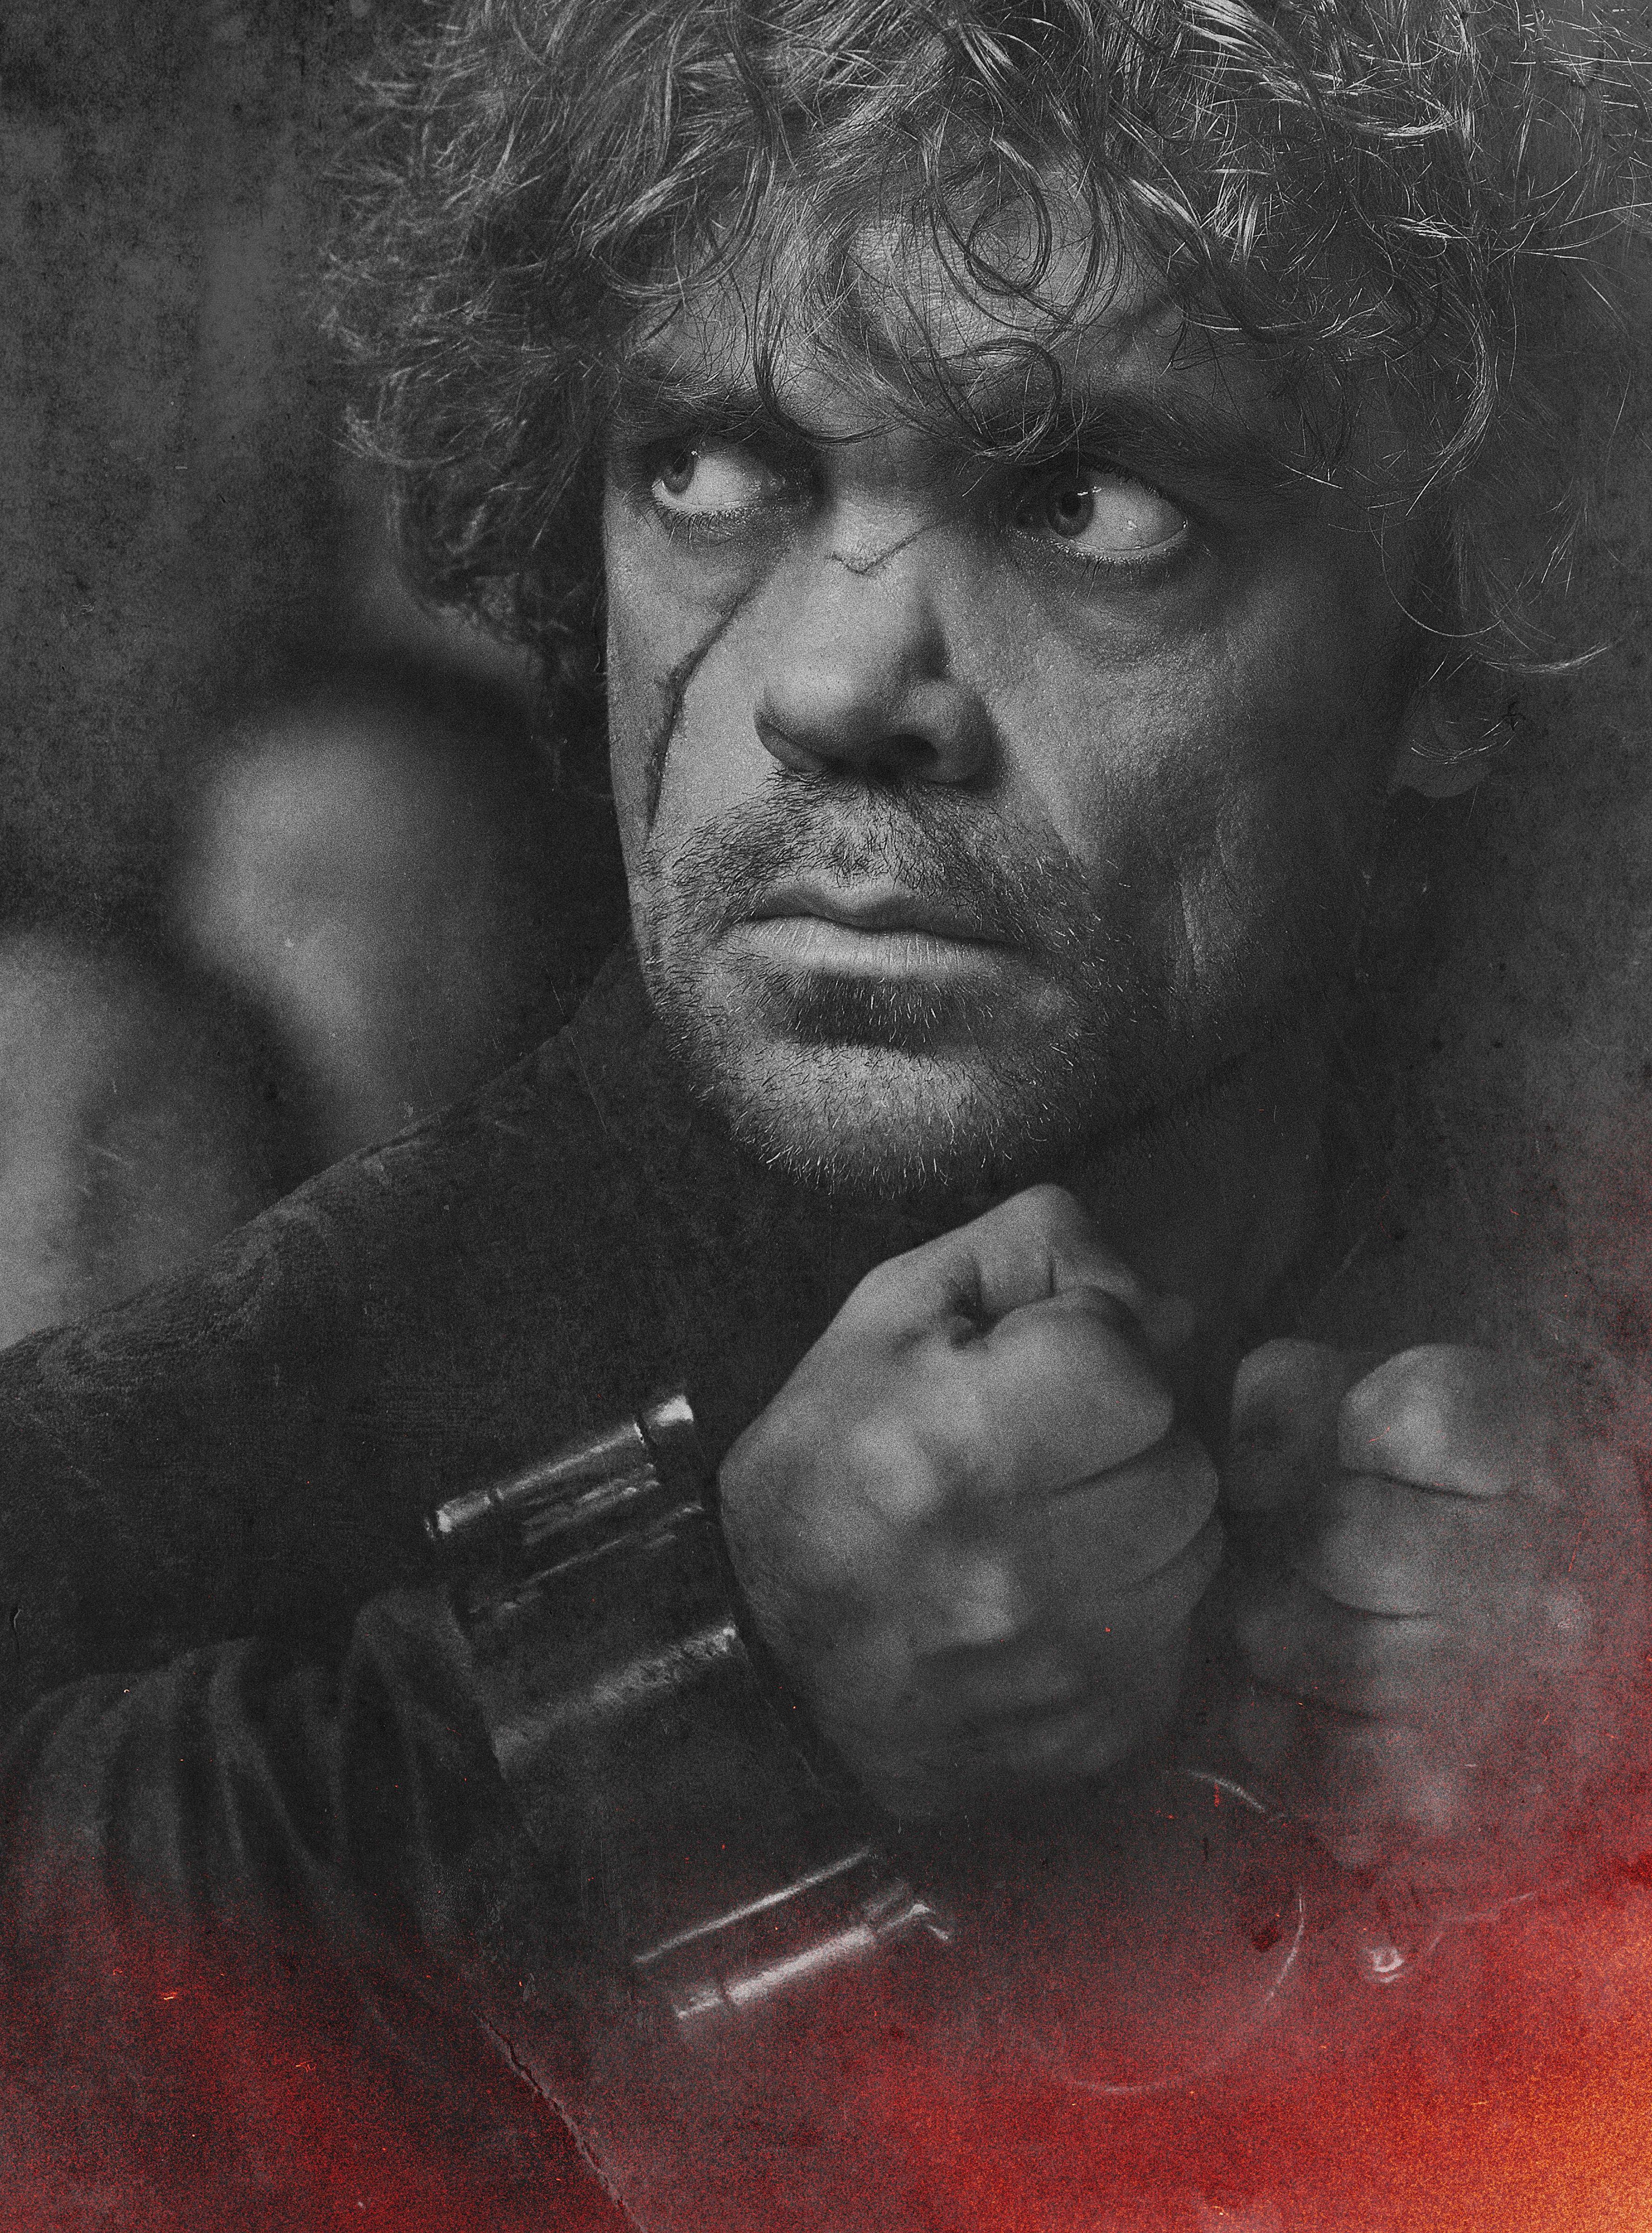 Game of Thrones - Season 4 - Tyrion Lannister | Gane of Trhones ...